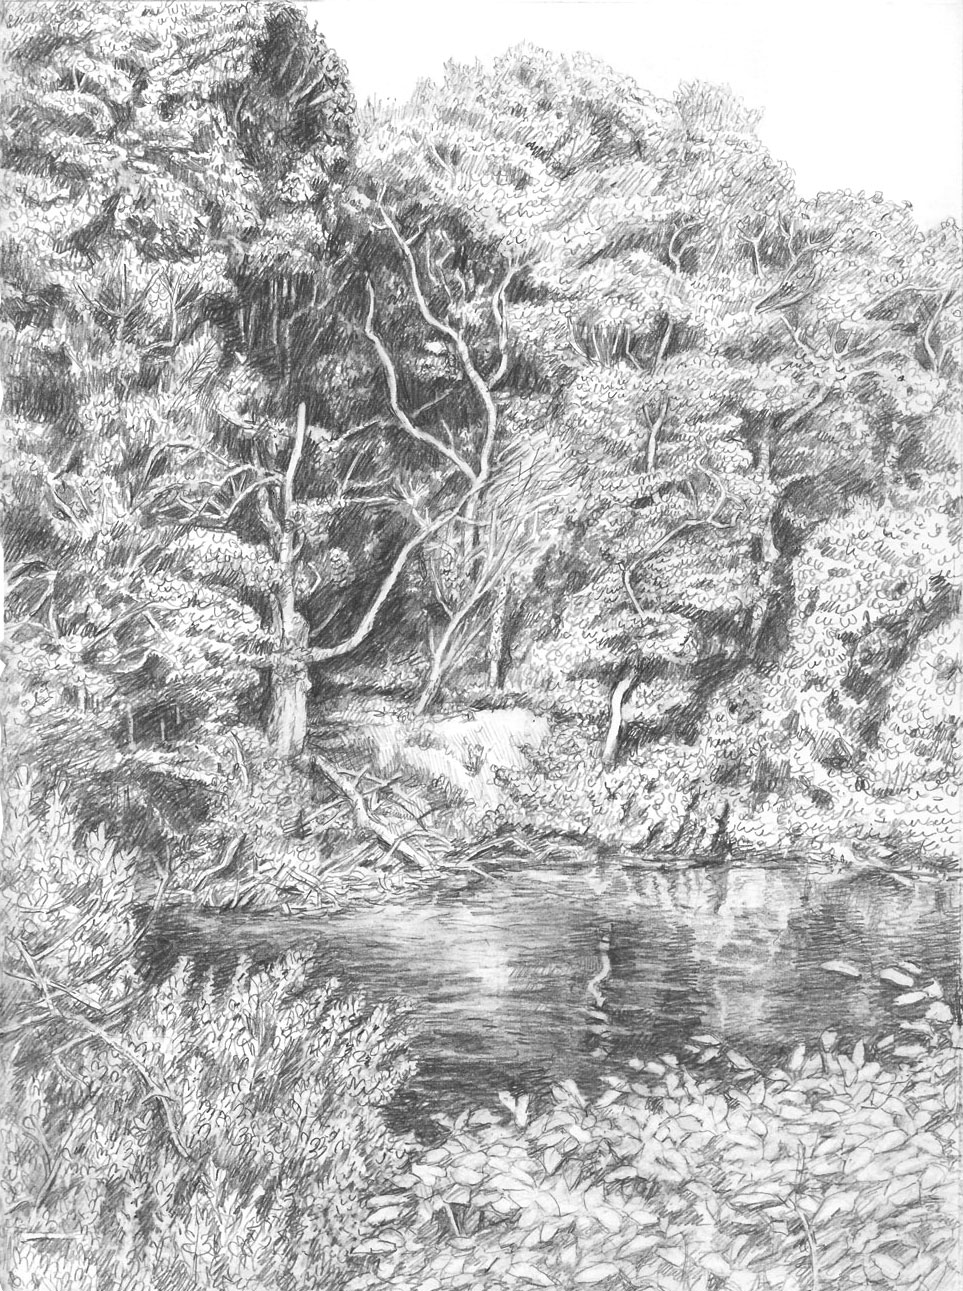 The Narrow River